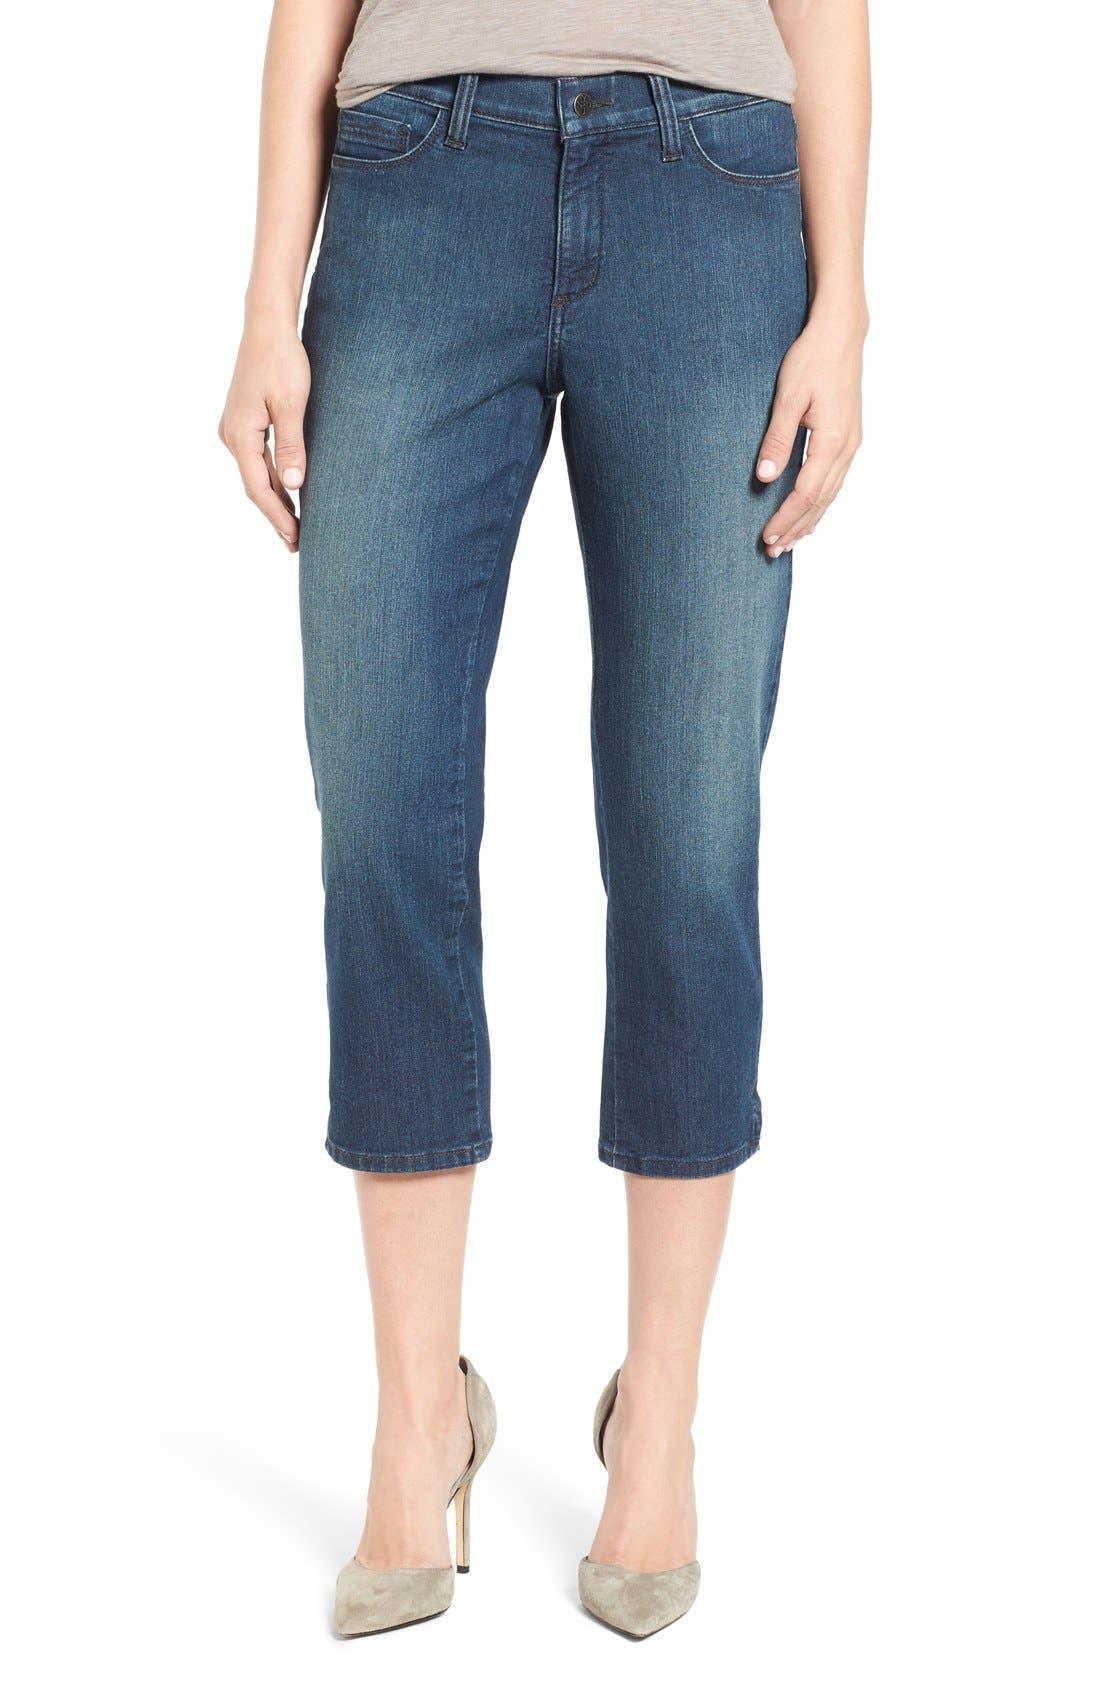 NYDJ Alina Stretch Capri Jeans (Nottingham) (Regular & Petite)